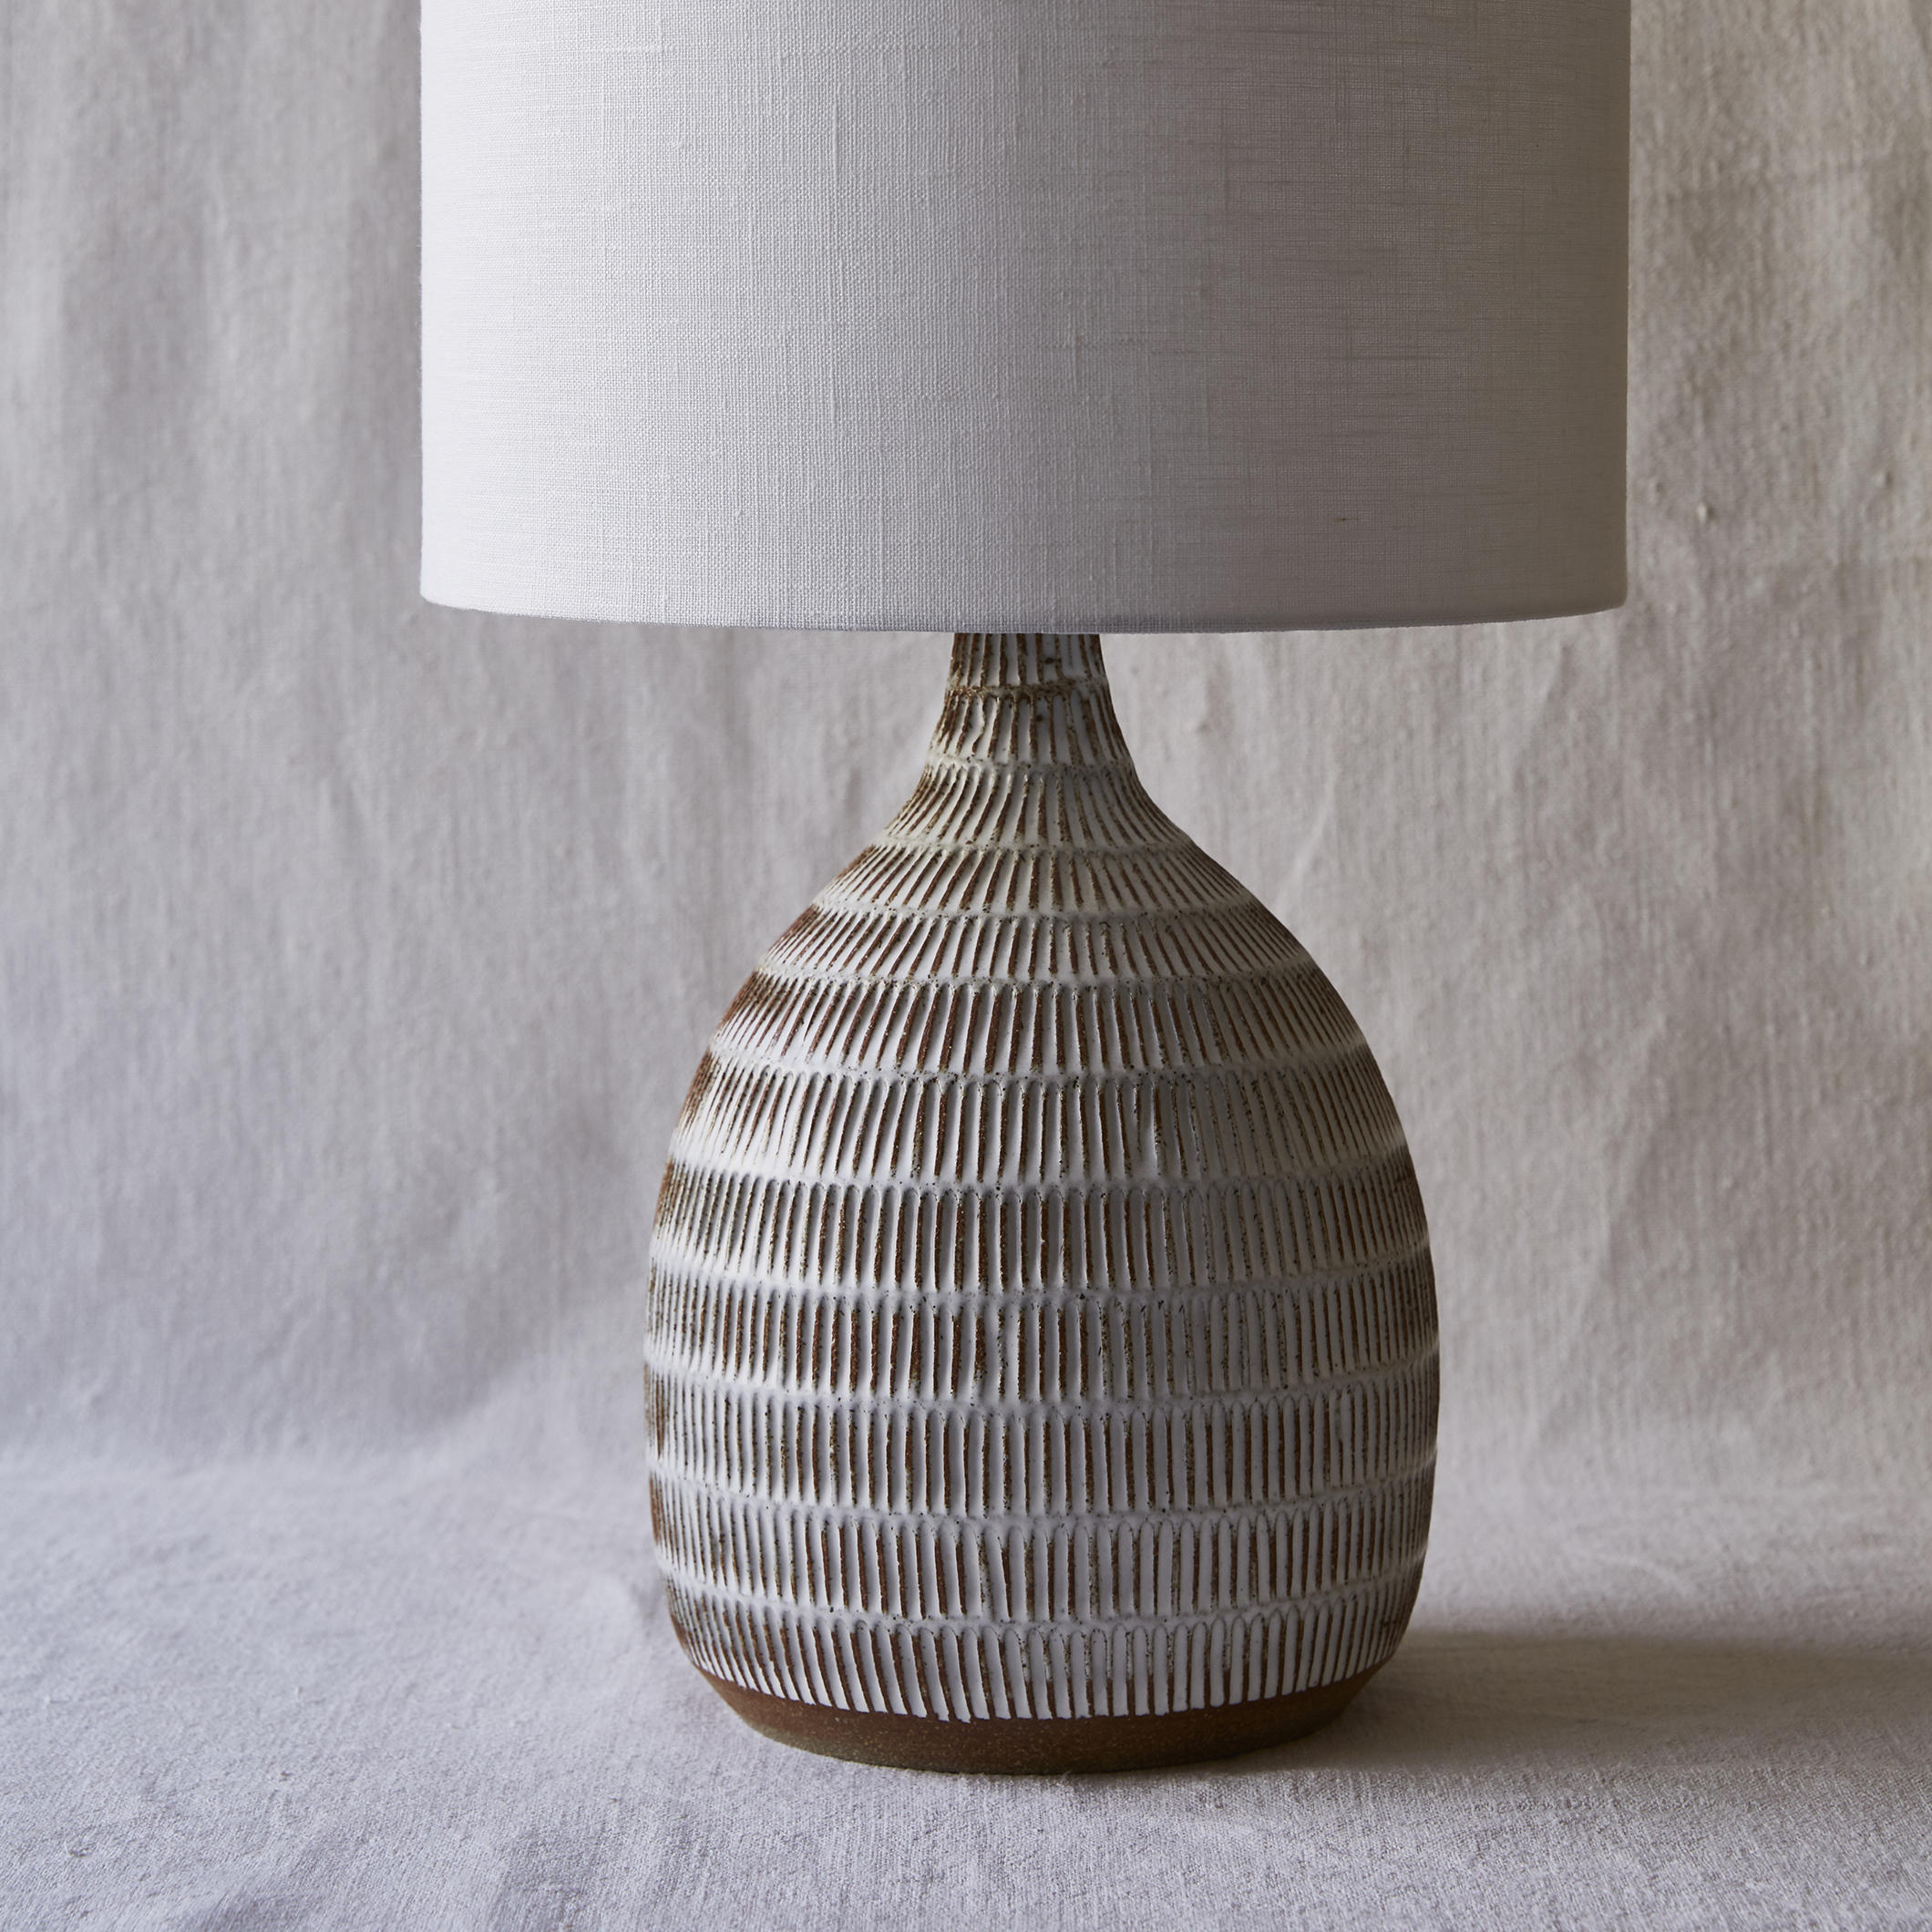 Mt Washington Pottery bottle lamp.jpg